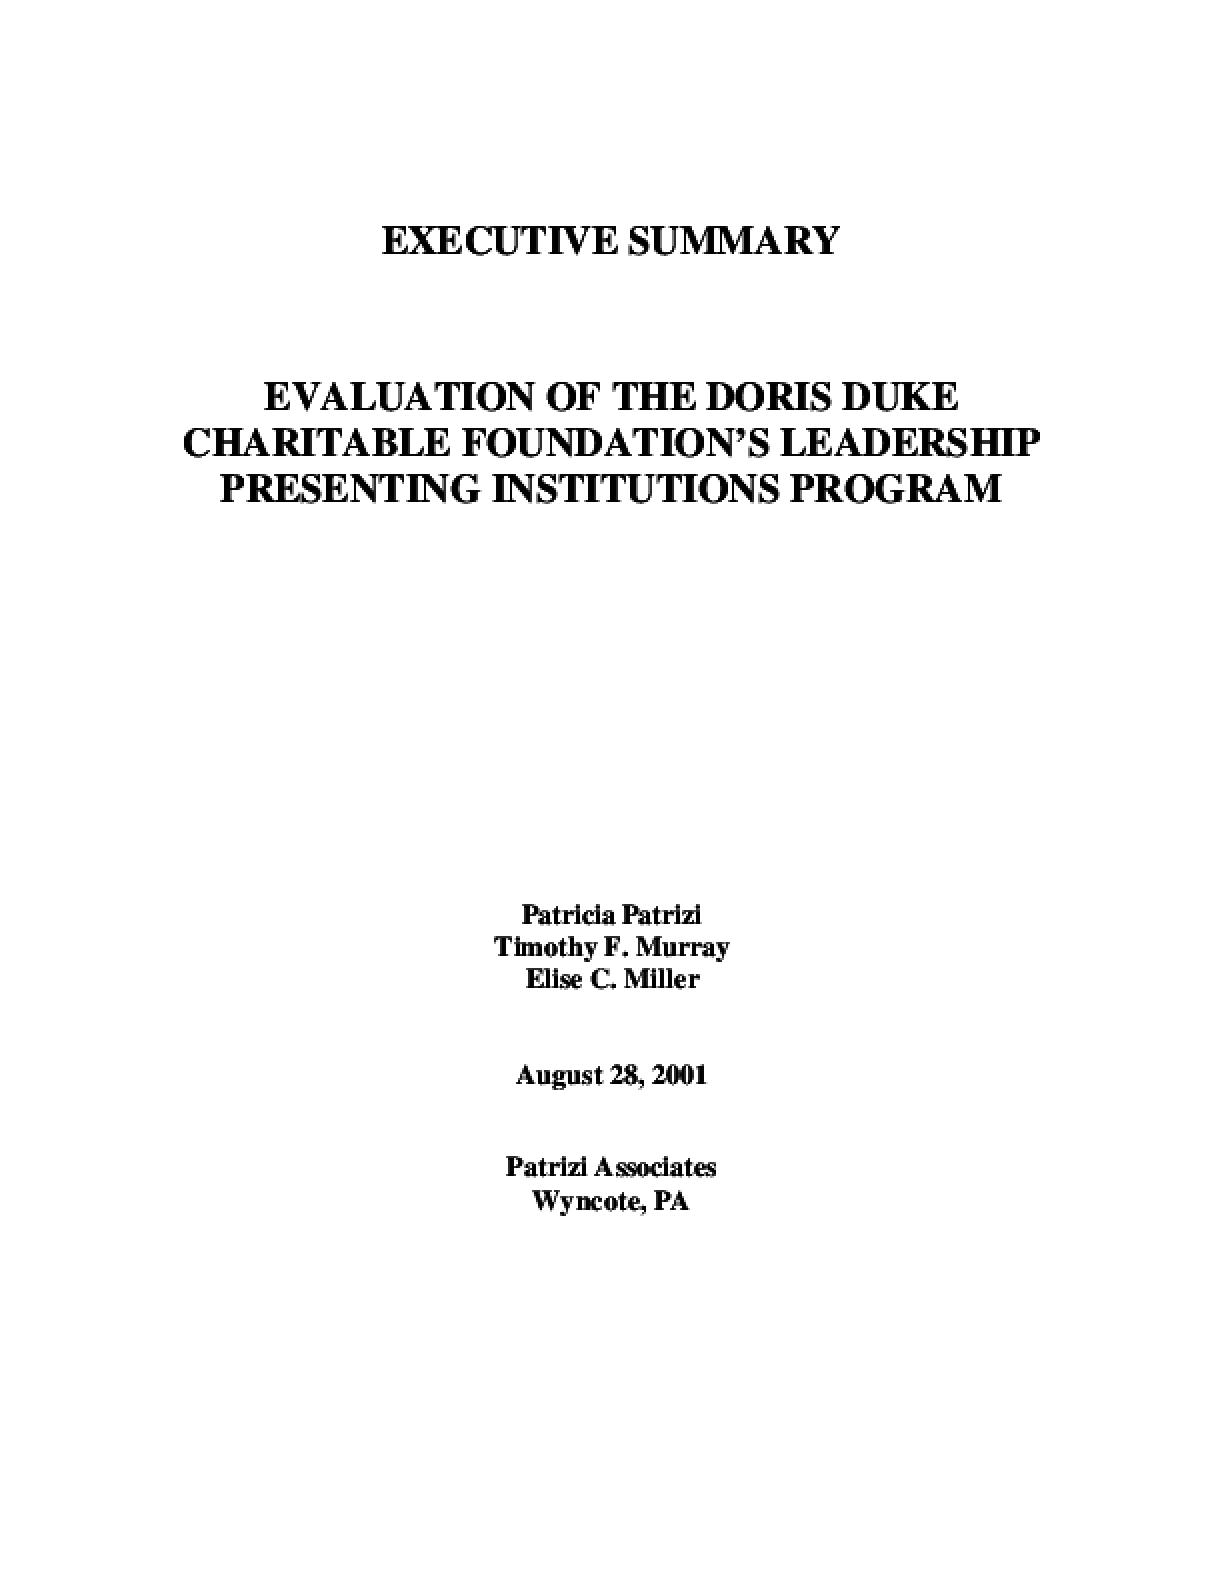 Evaluation of the Doris Duke Charitable Foundation's Leadership Presenting Institution Program: Executive Summary